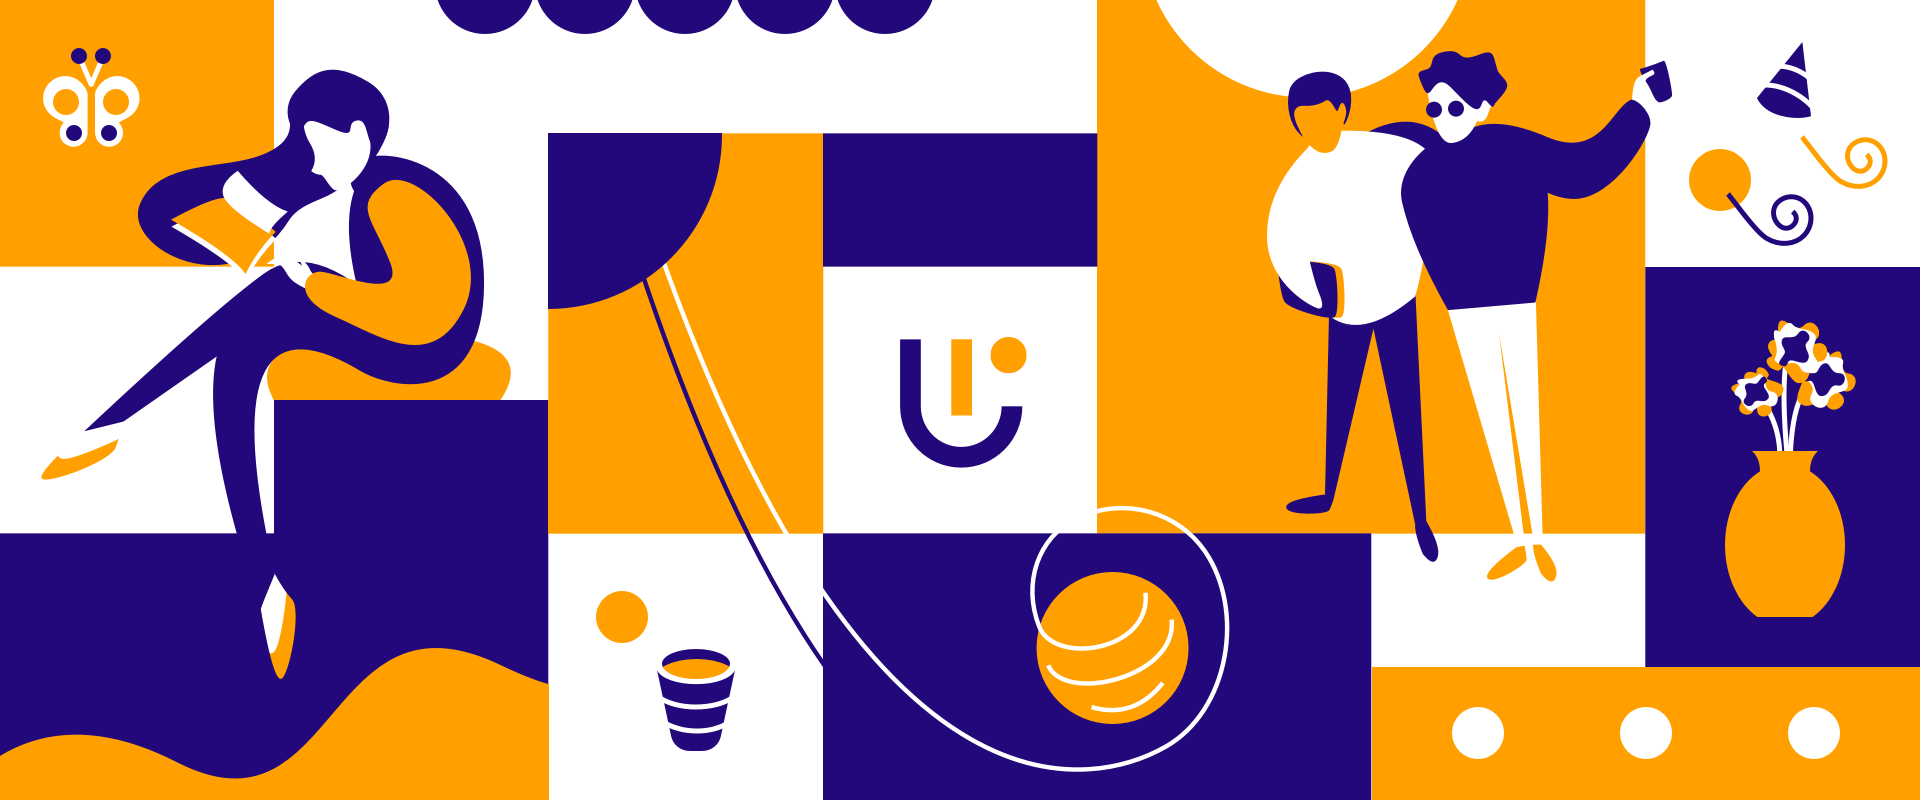 Uni phi illustration